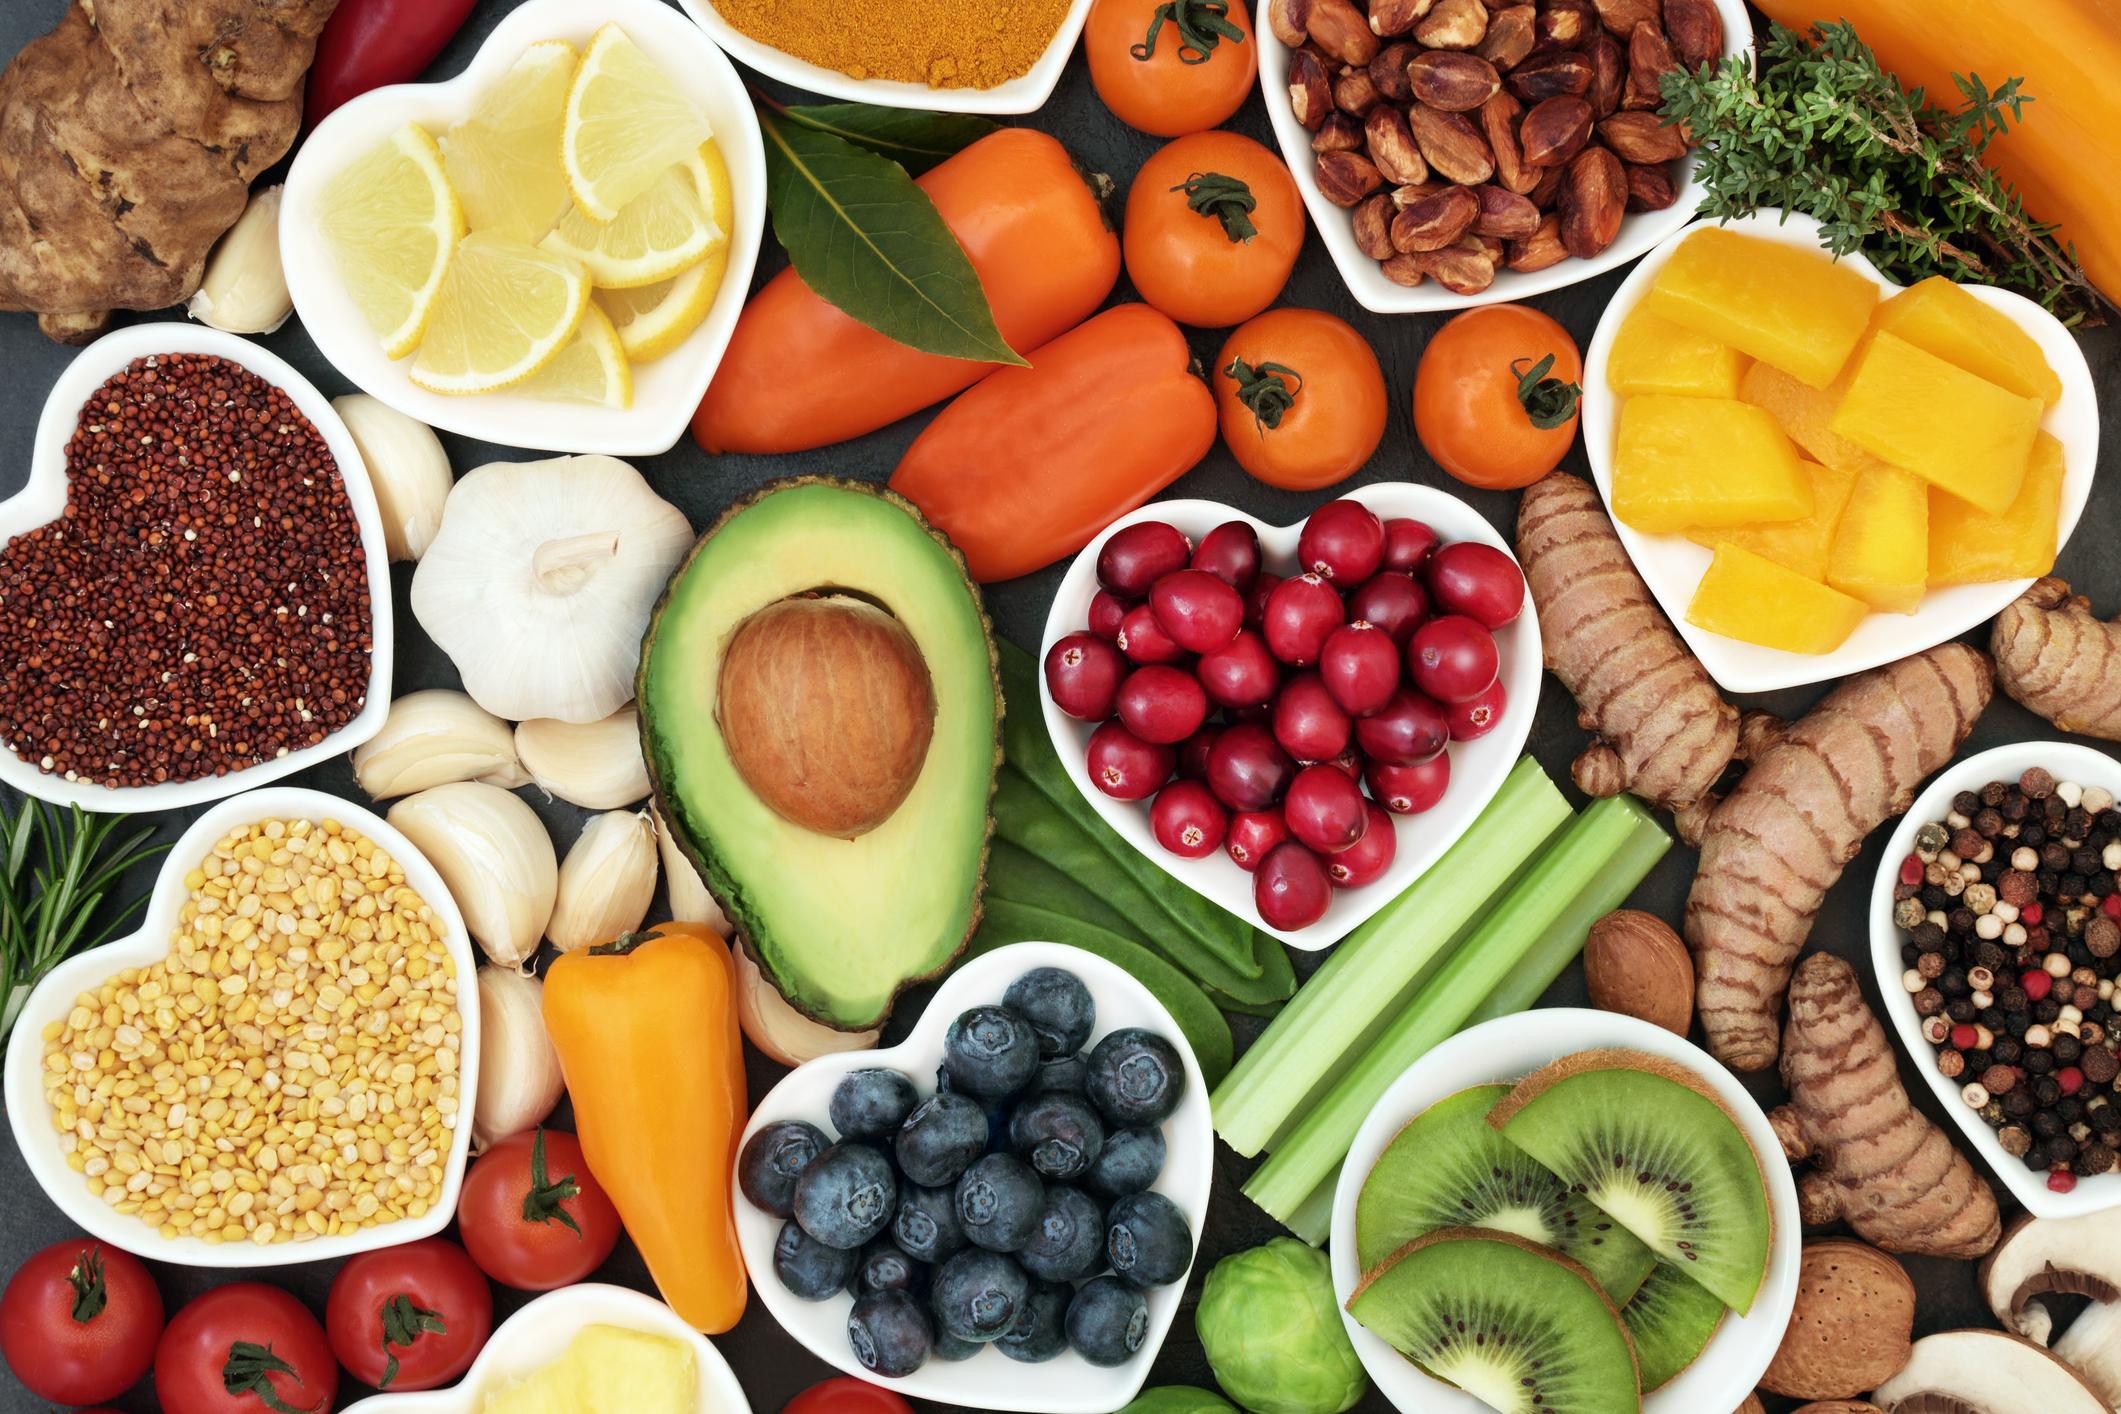 A sampling of organic produce.